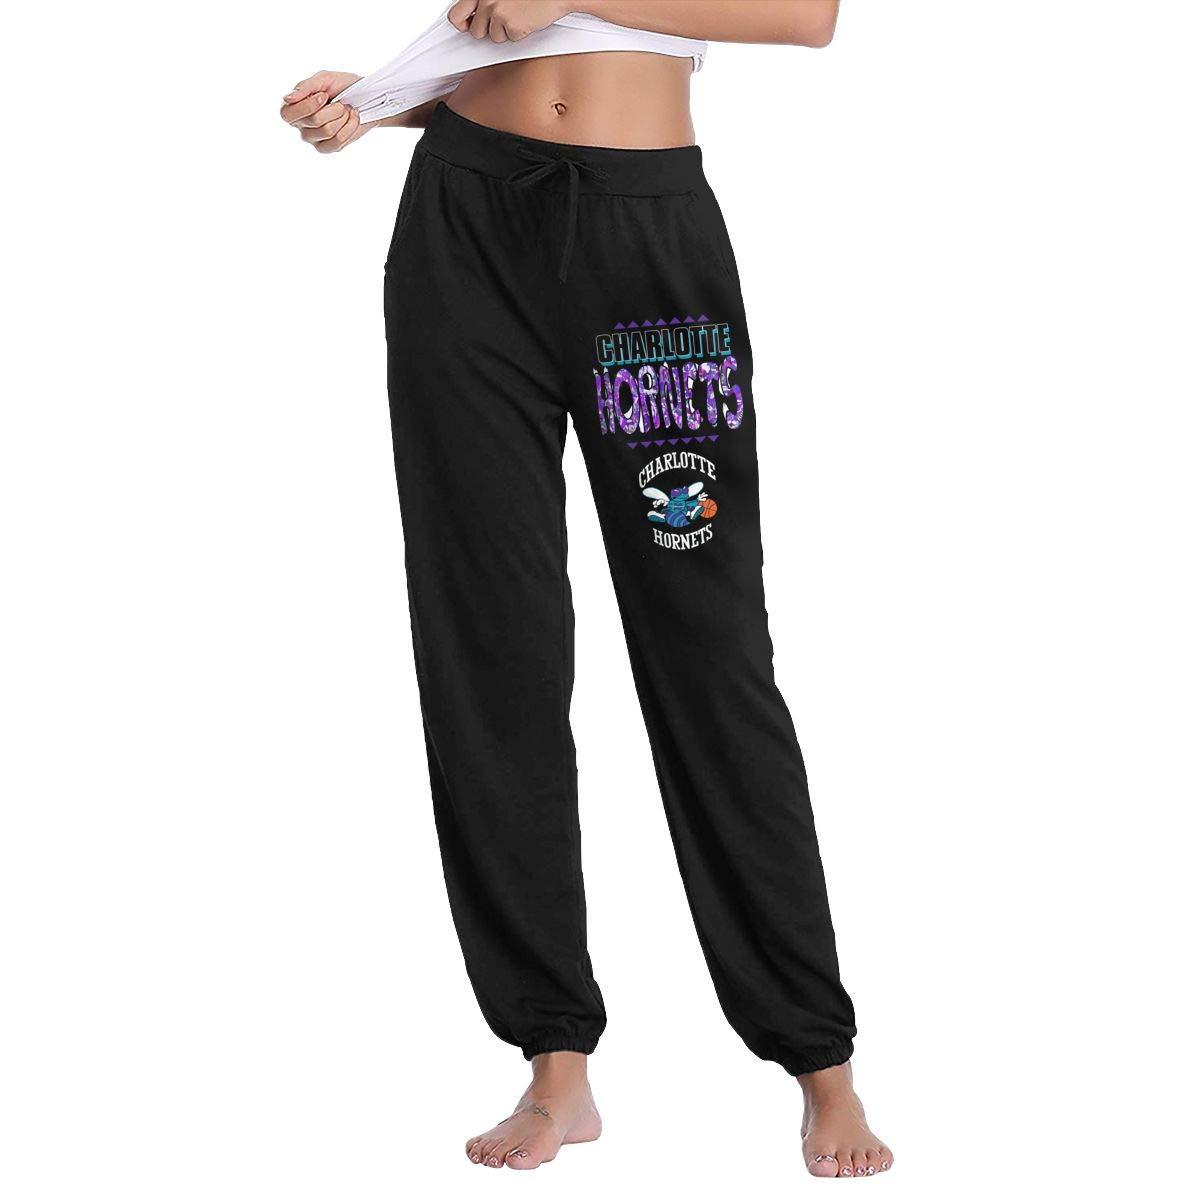 Black XXL GavDon Women's Men'sCharlotteHornets20logo Casual Sweatpants Yoga Jogger Lounge Sweat Pants with Pockets